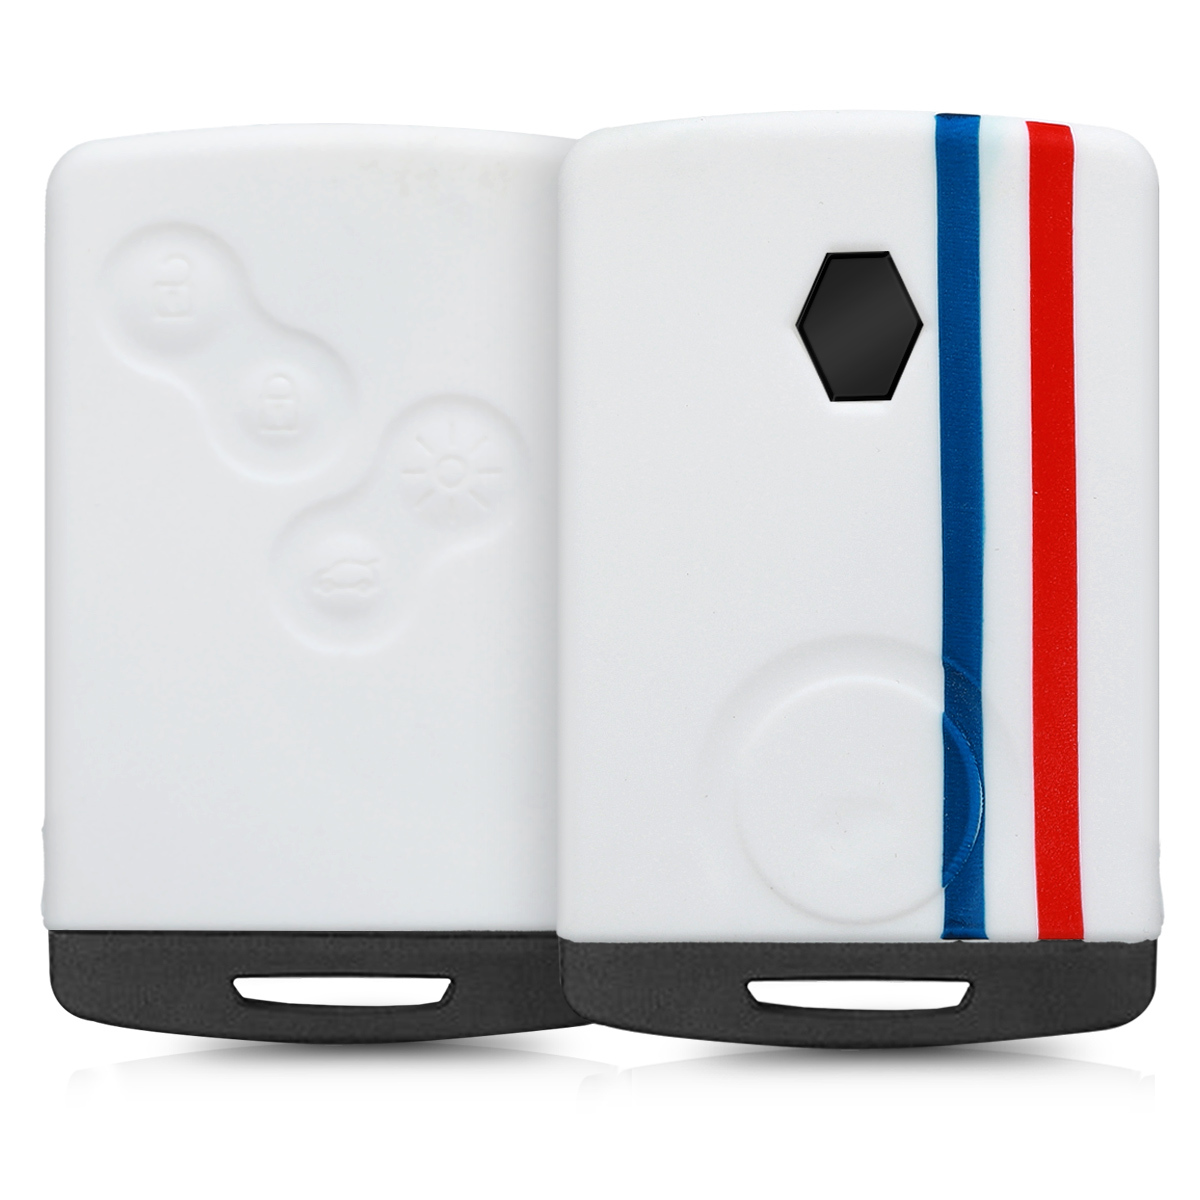 KW Θήκη Κλειδιού Renault - Σιλικόνη - 4 Κουμπιά Keyless Go - Blue / Red / White (45655.10)